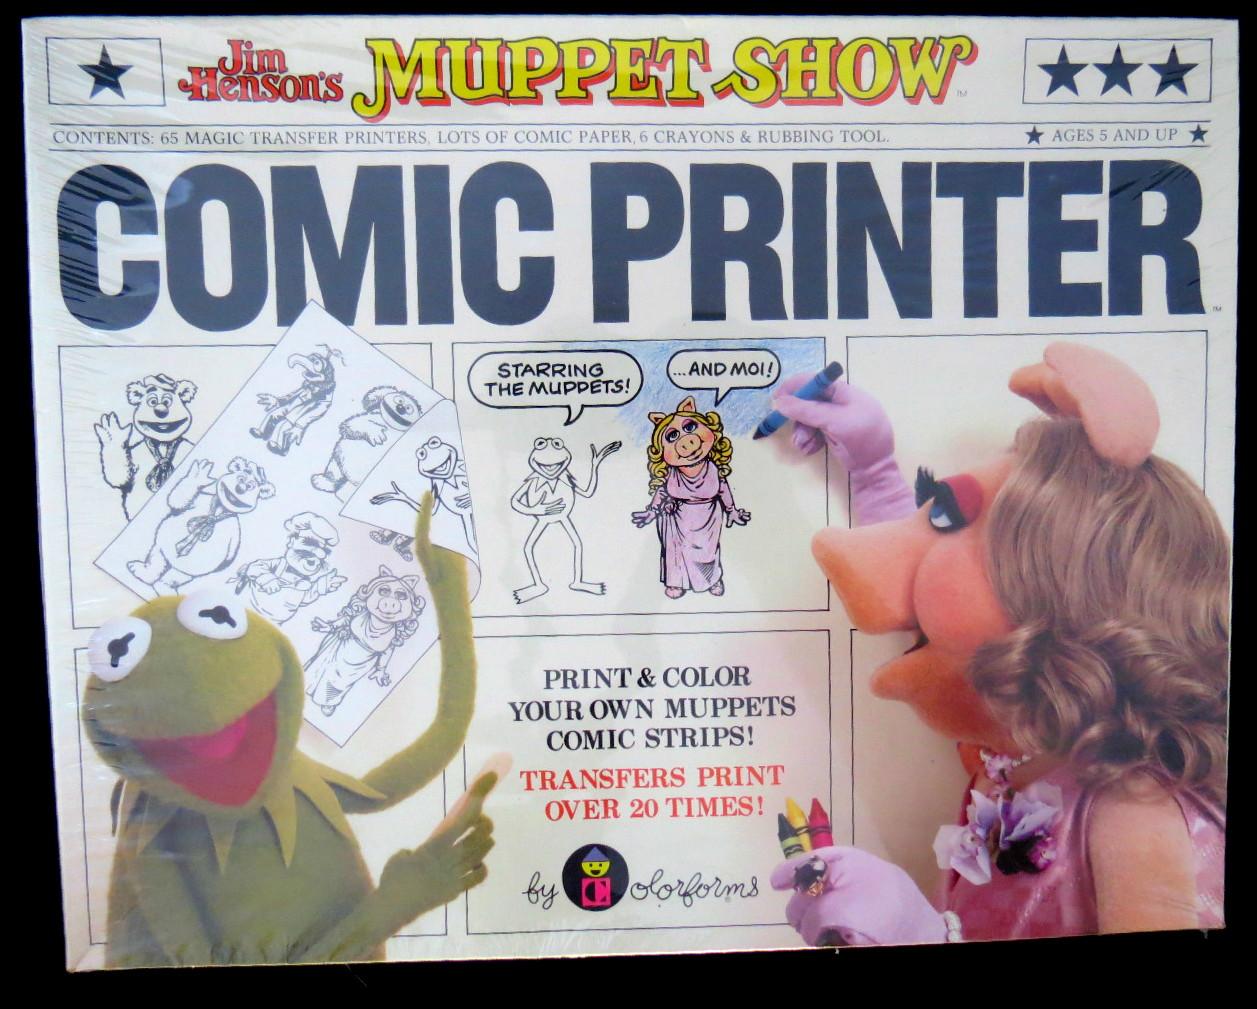 Muppet Show Comic Printer